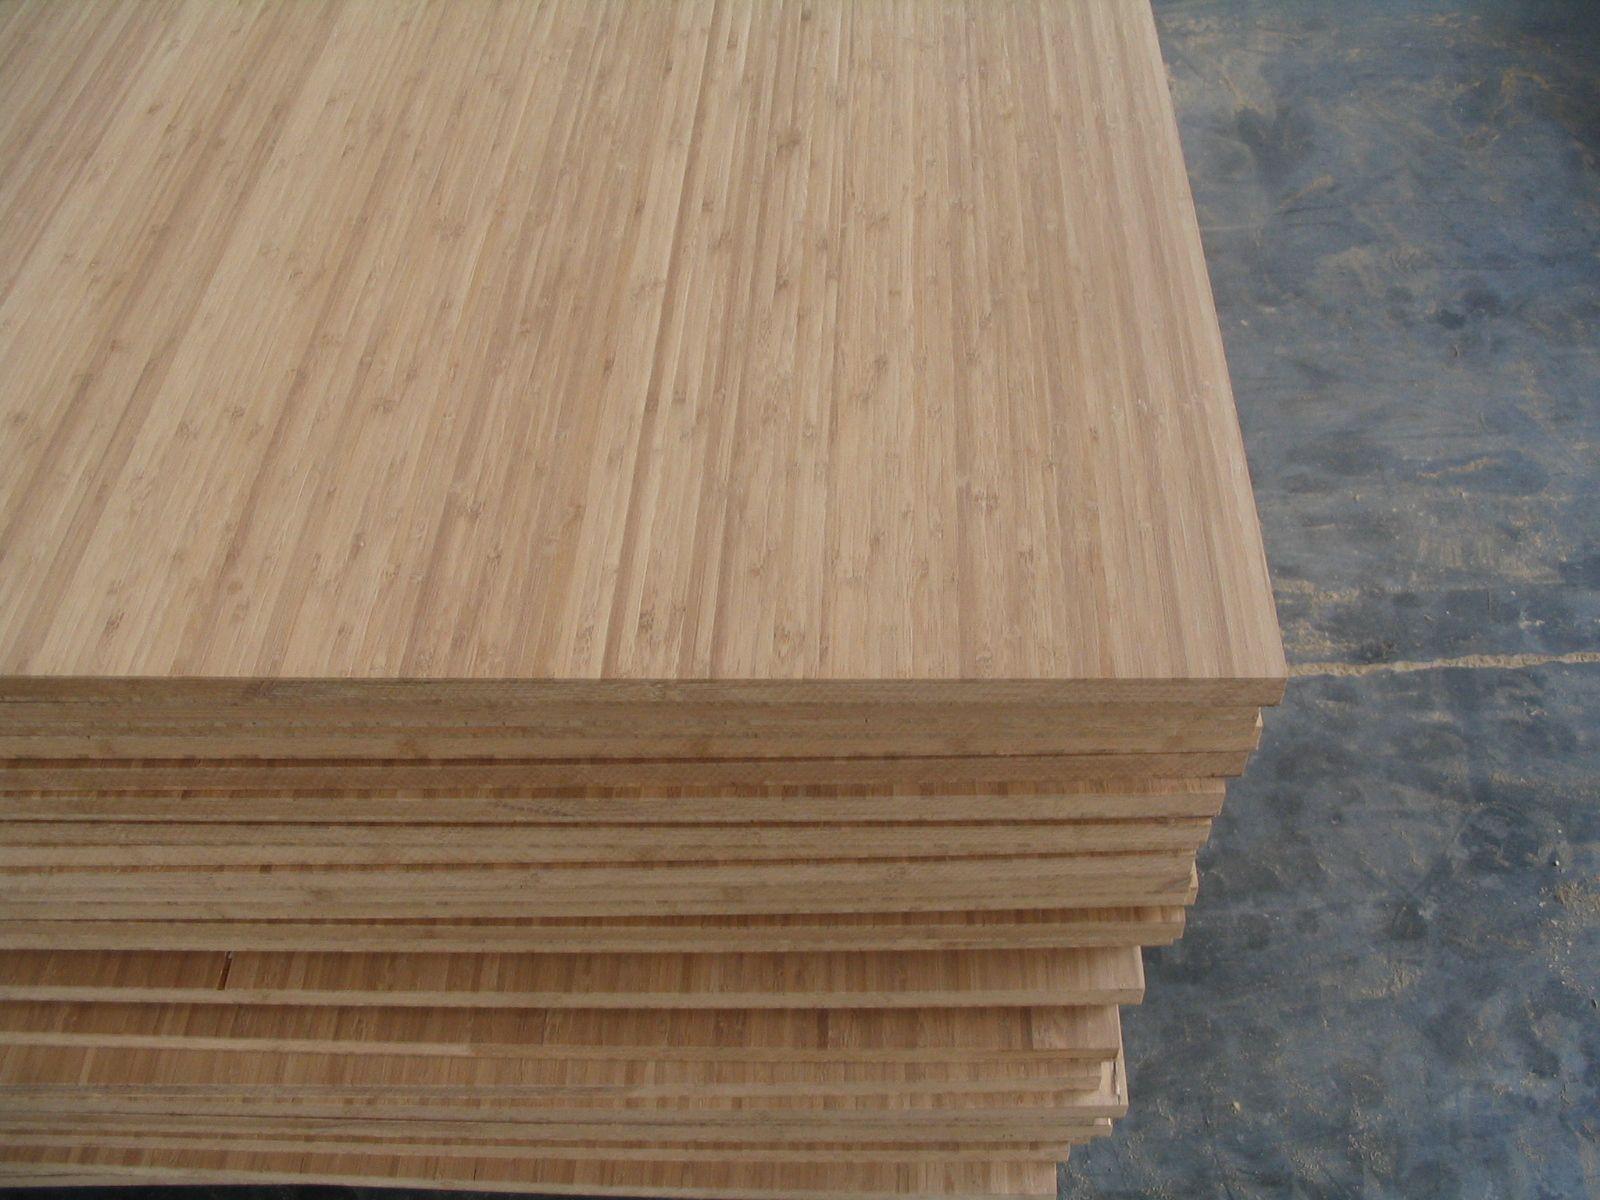 Bamboo Panels Strand Woven Bamboo Plywood Bambus Platten Bamboo Bamboo Plywood Bamboo Panels